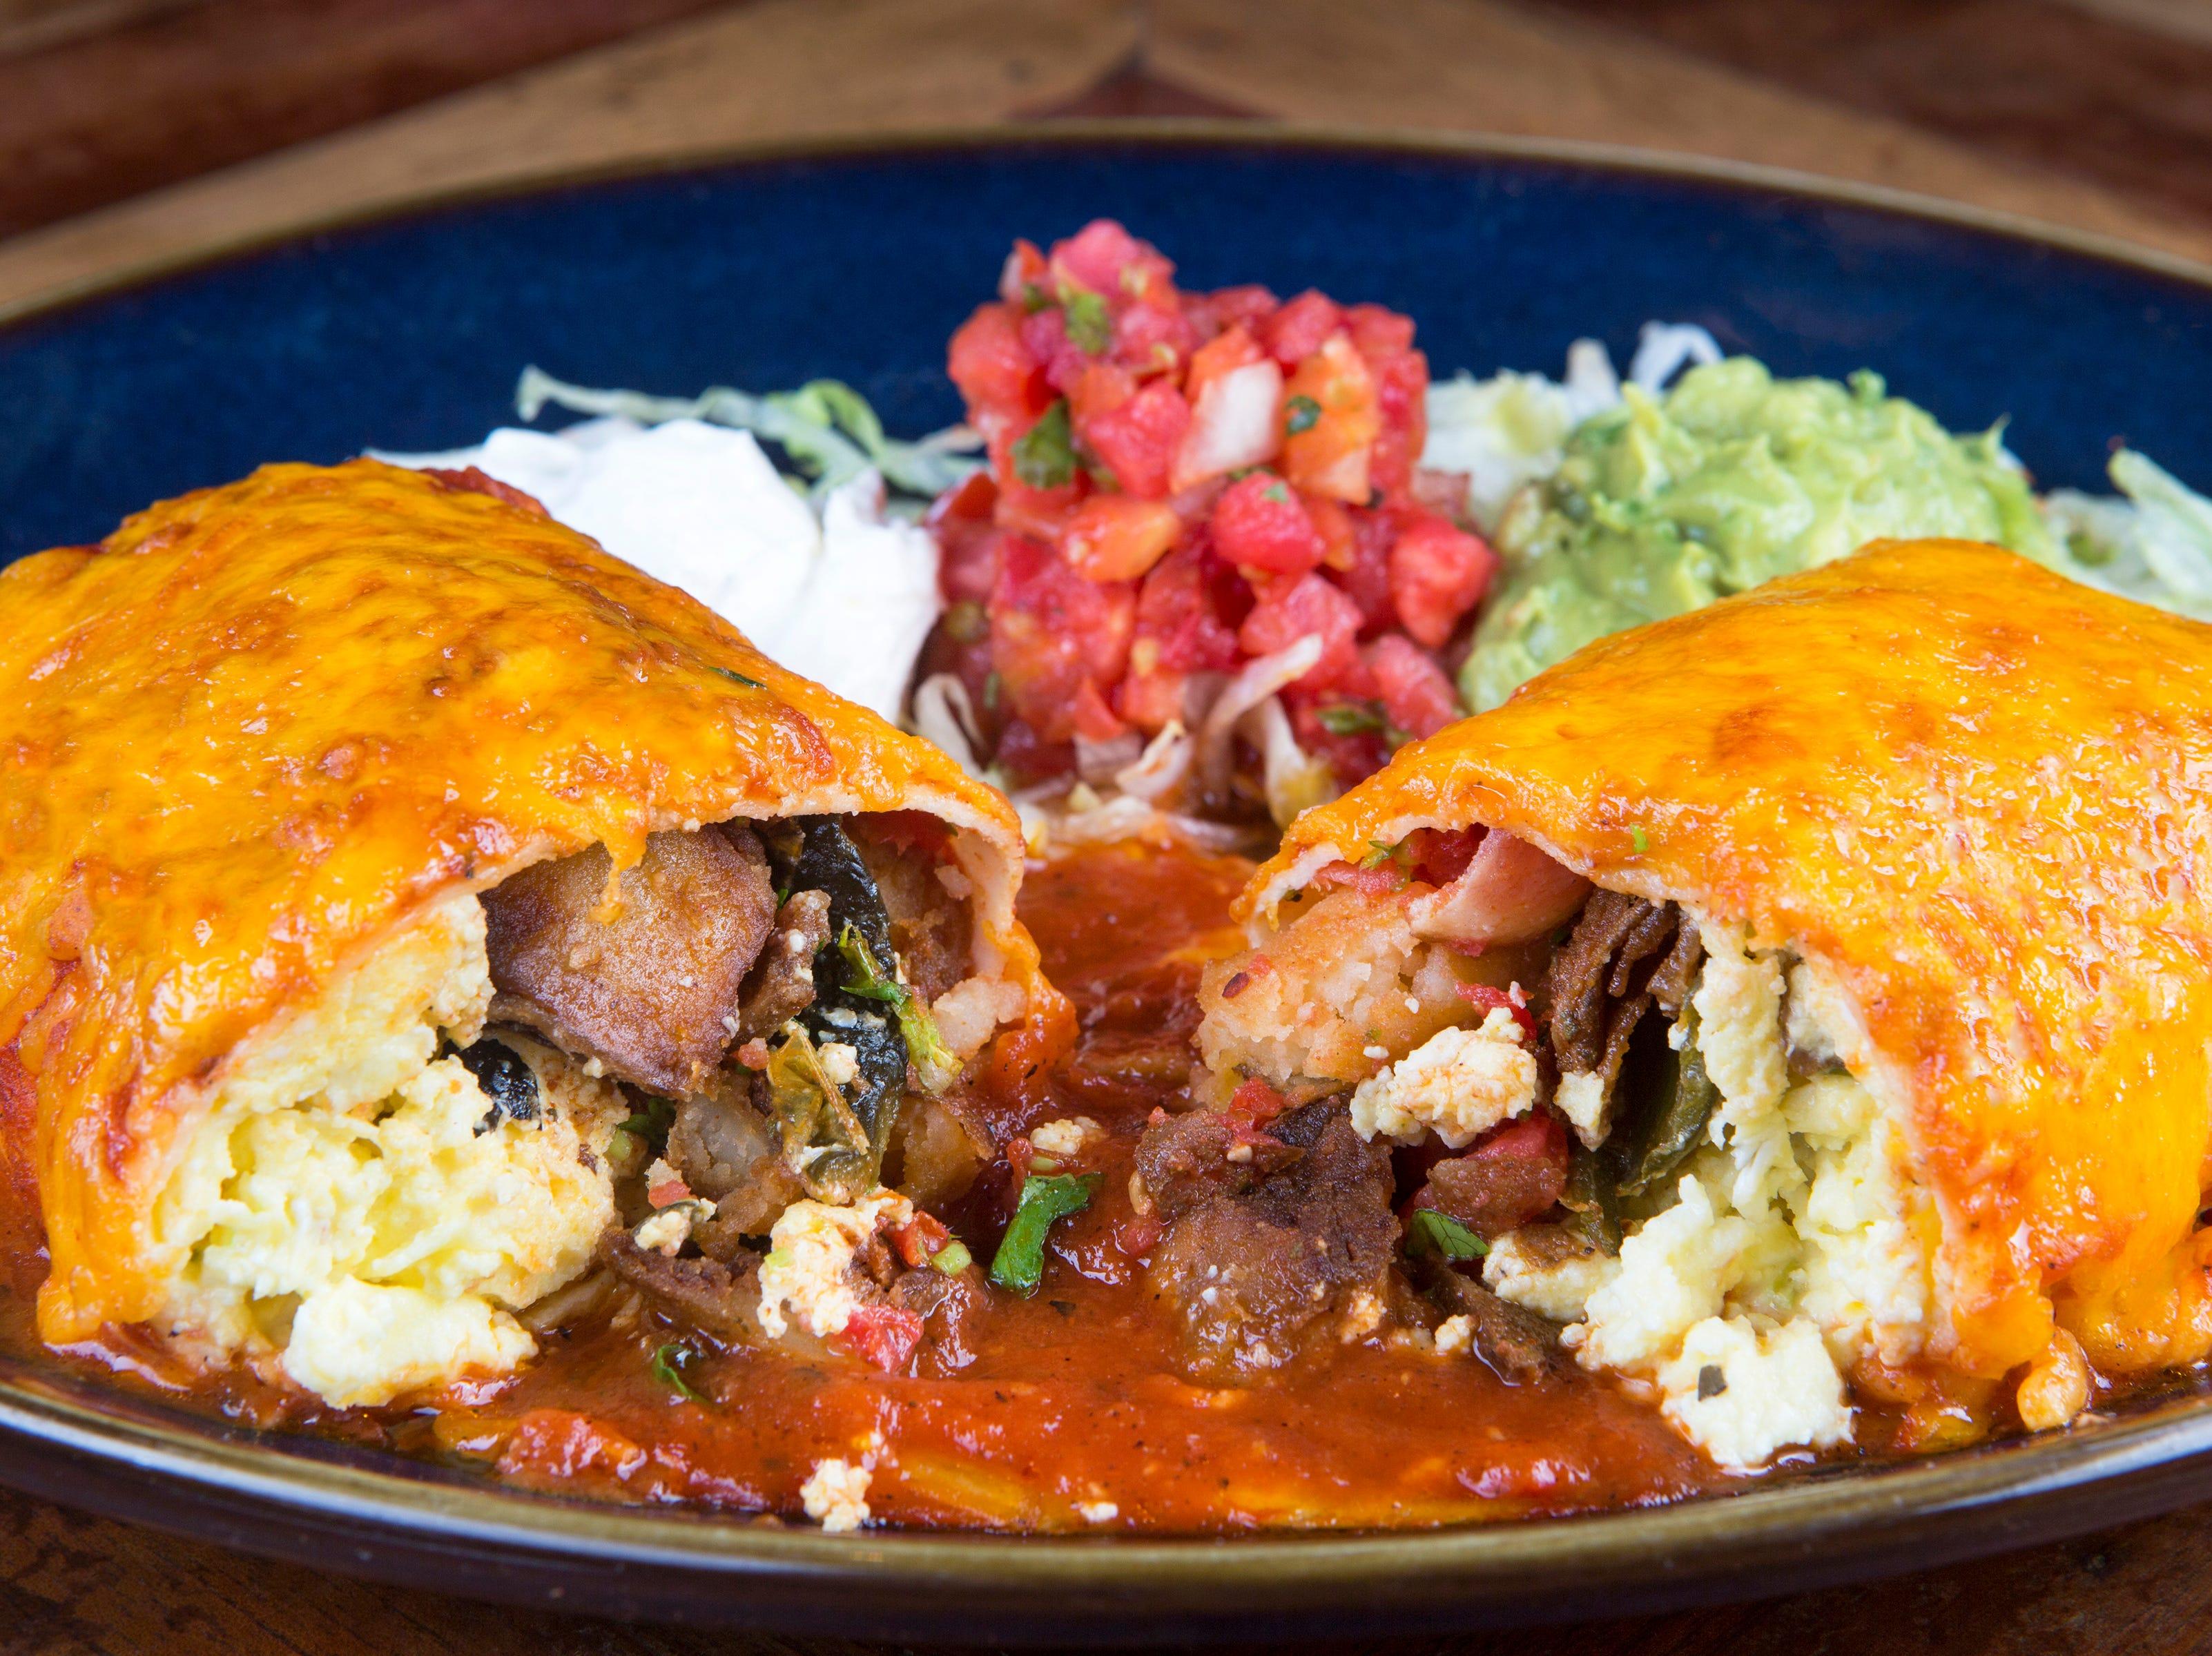 A Wet Burrito Con Huevos at Rocco's Tacos & Tequila Bar is a brunch entree with scrambled eggs, sliced poblano pepper, bacon, potatoes, cheese, guacamole, pico de gallo, sour cream and salsa roja.